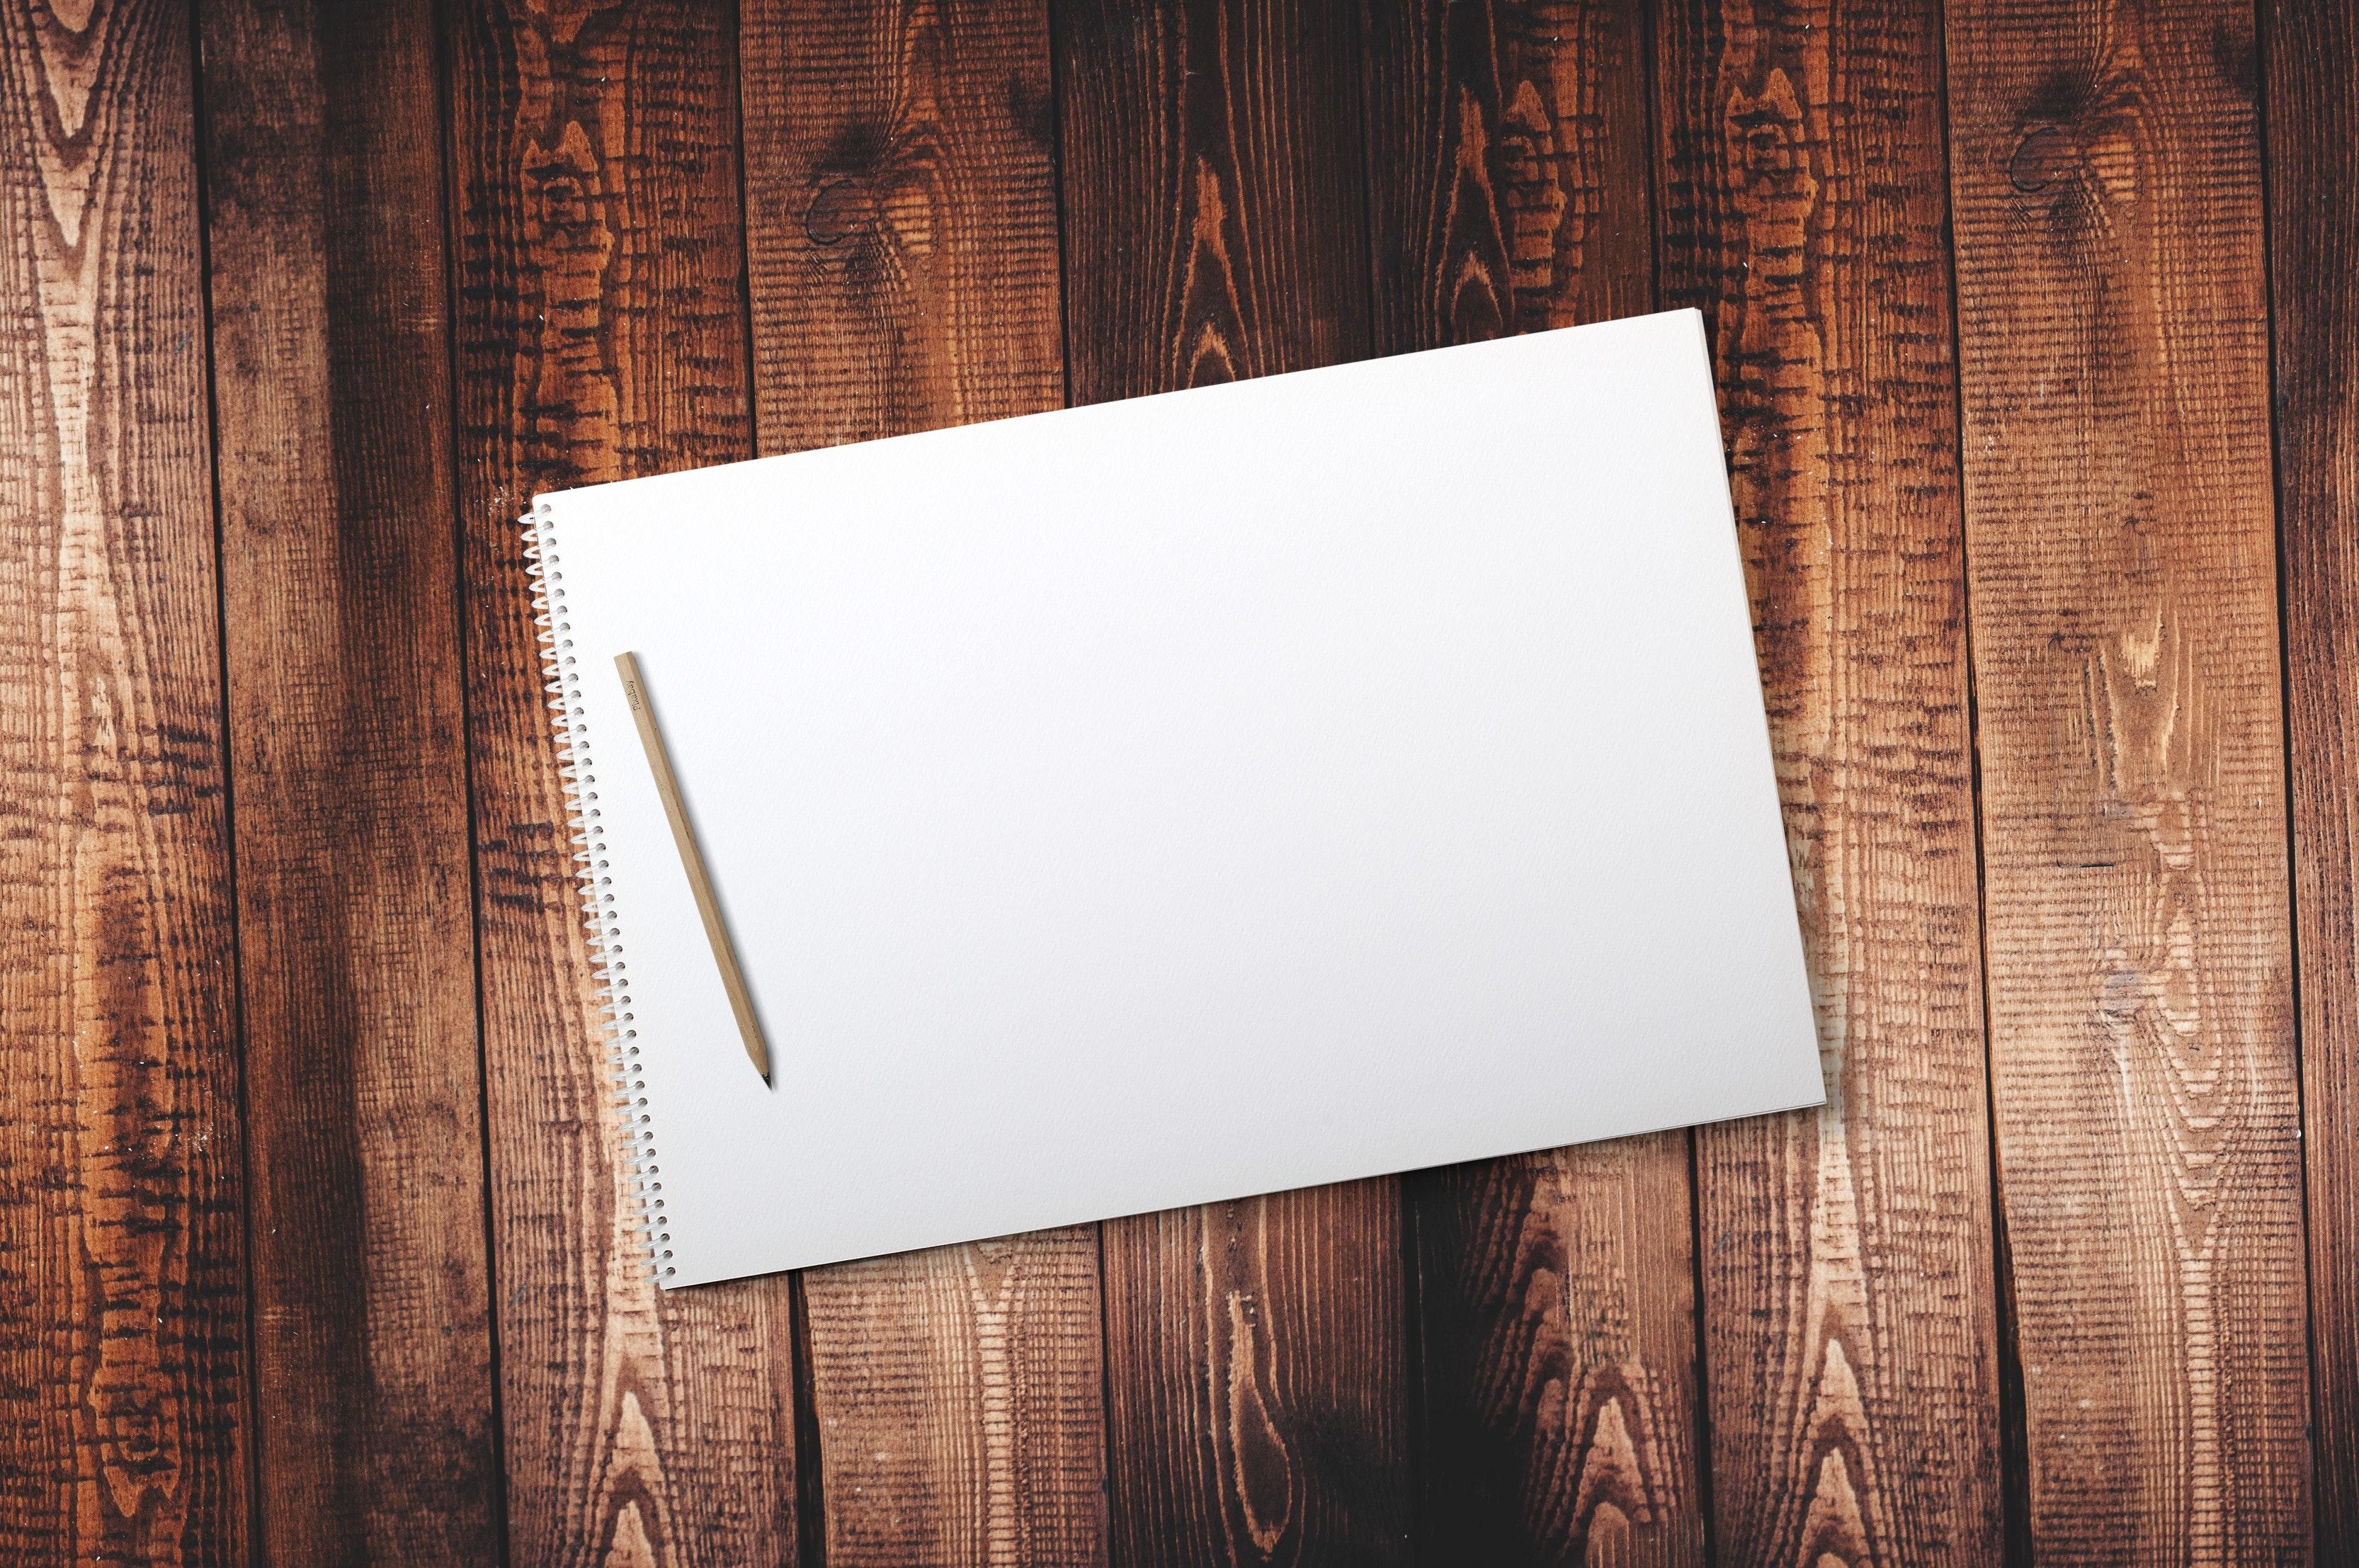 blank-notebook-paper-163031